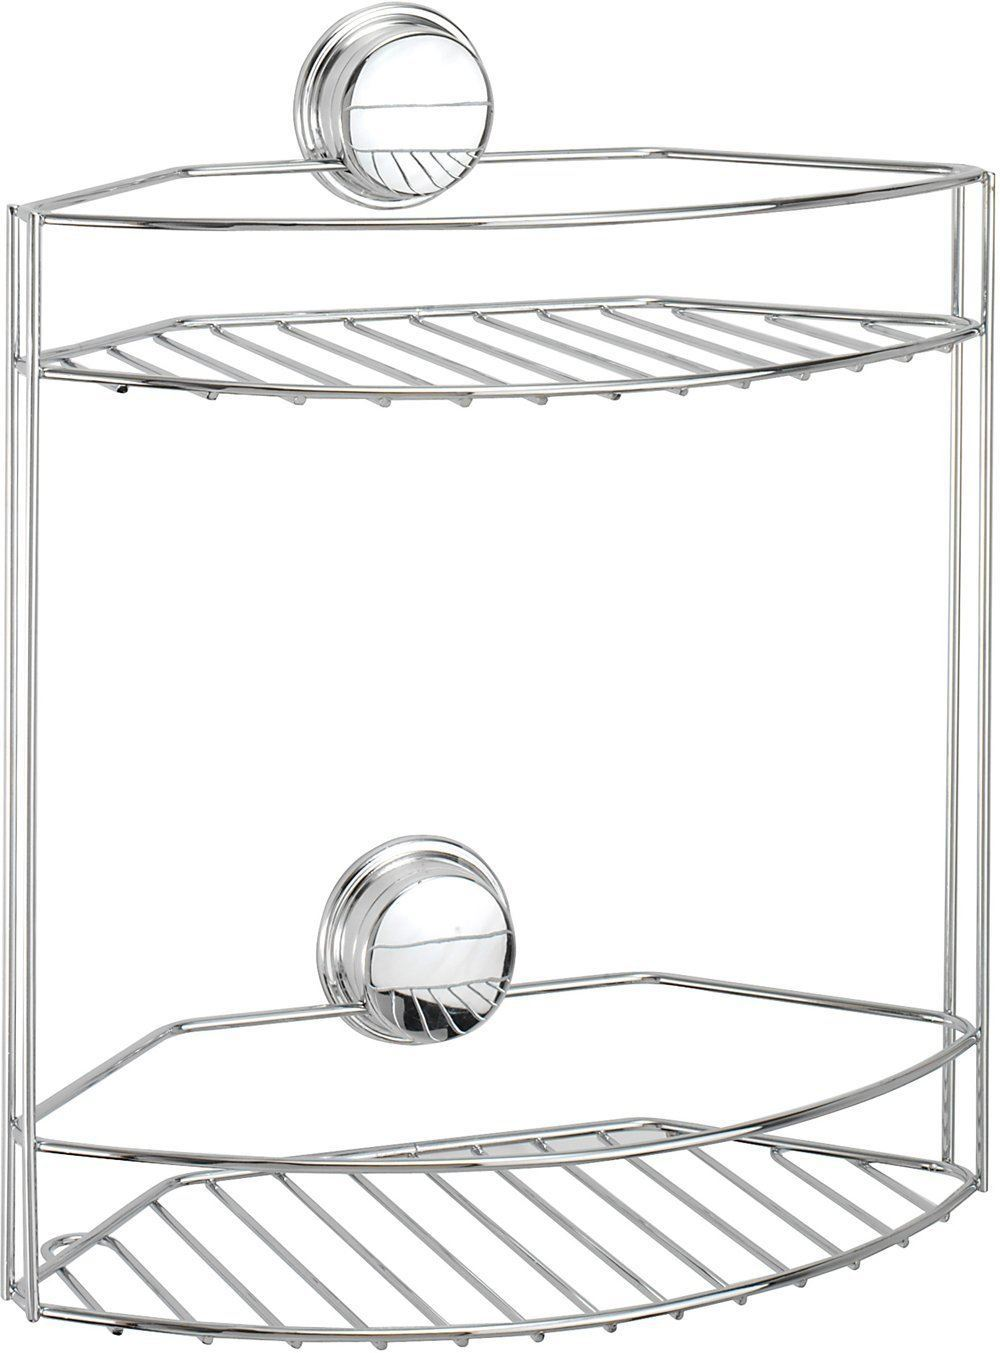 Tier basket shower caddy mild steel rust free stick n lock bathroom - Croydex Stick N Lock Plus 2 Tier Basket Chrome Plated Storage Shower Bath Cady